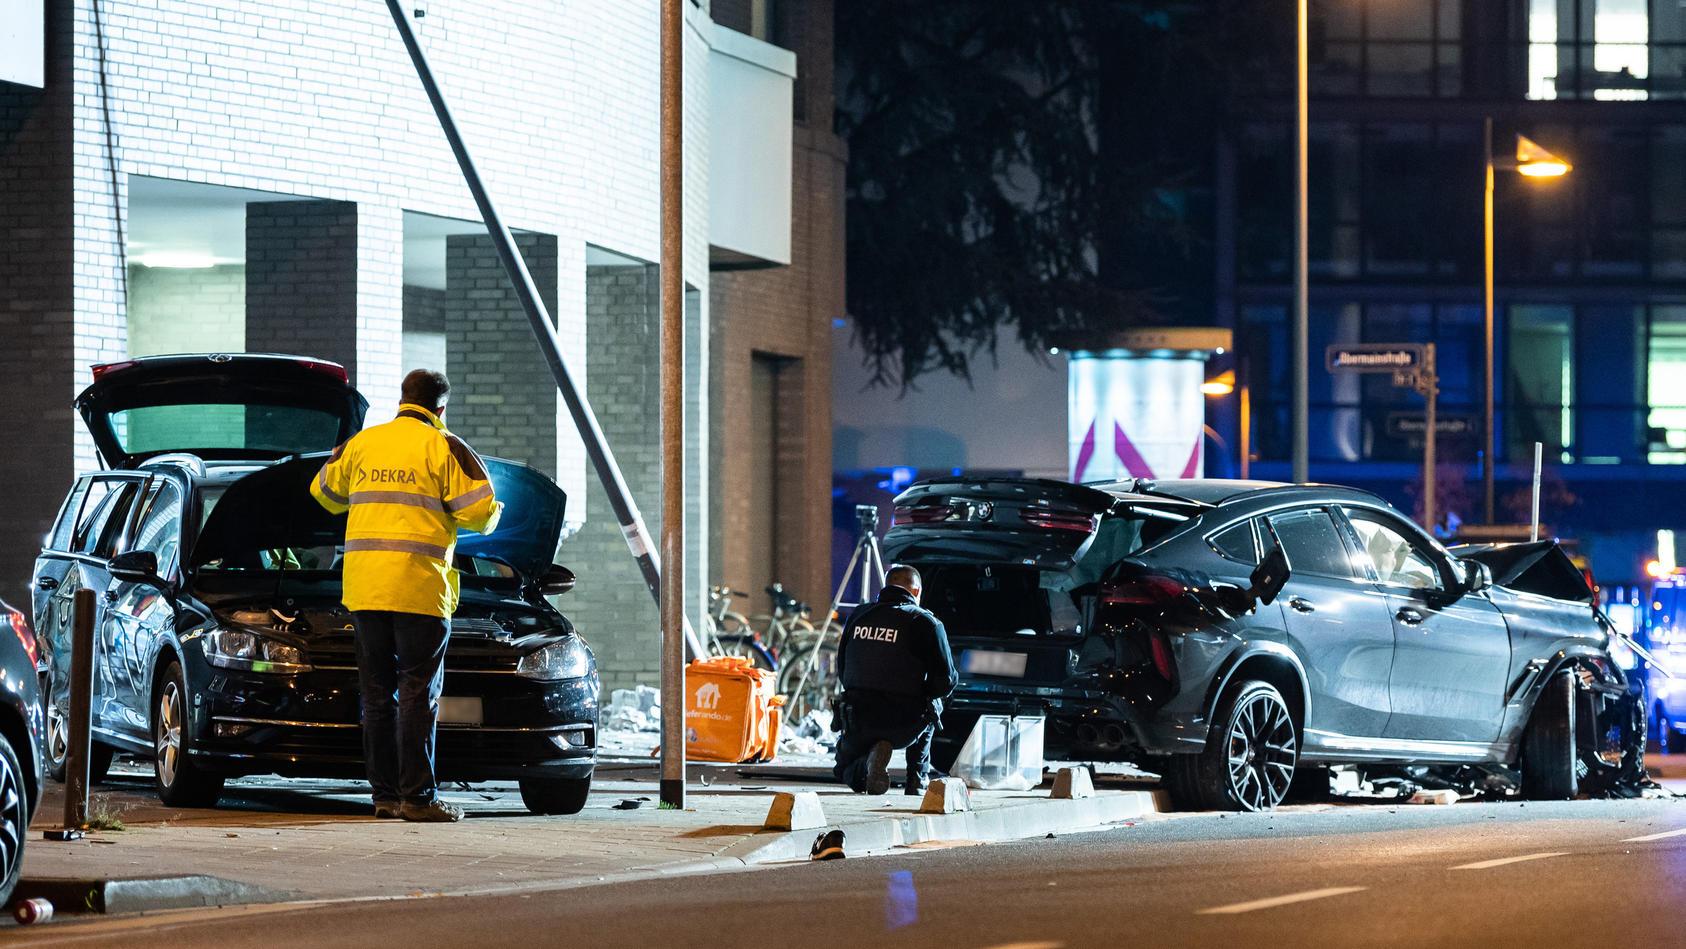 Bei dem Unfall im November sterben 2 Menschen.